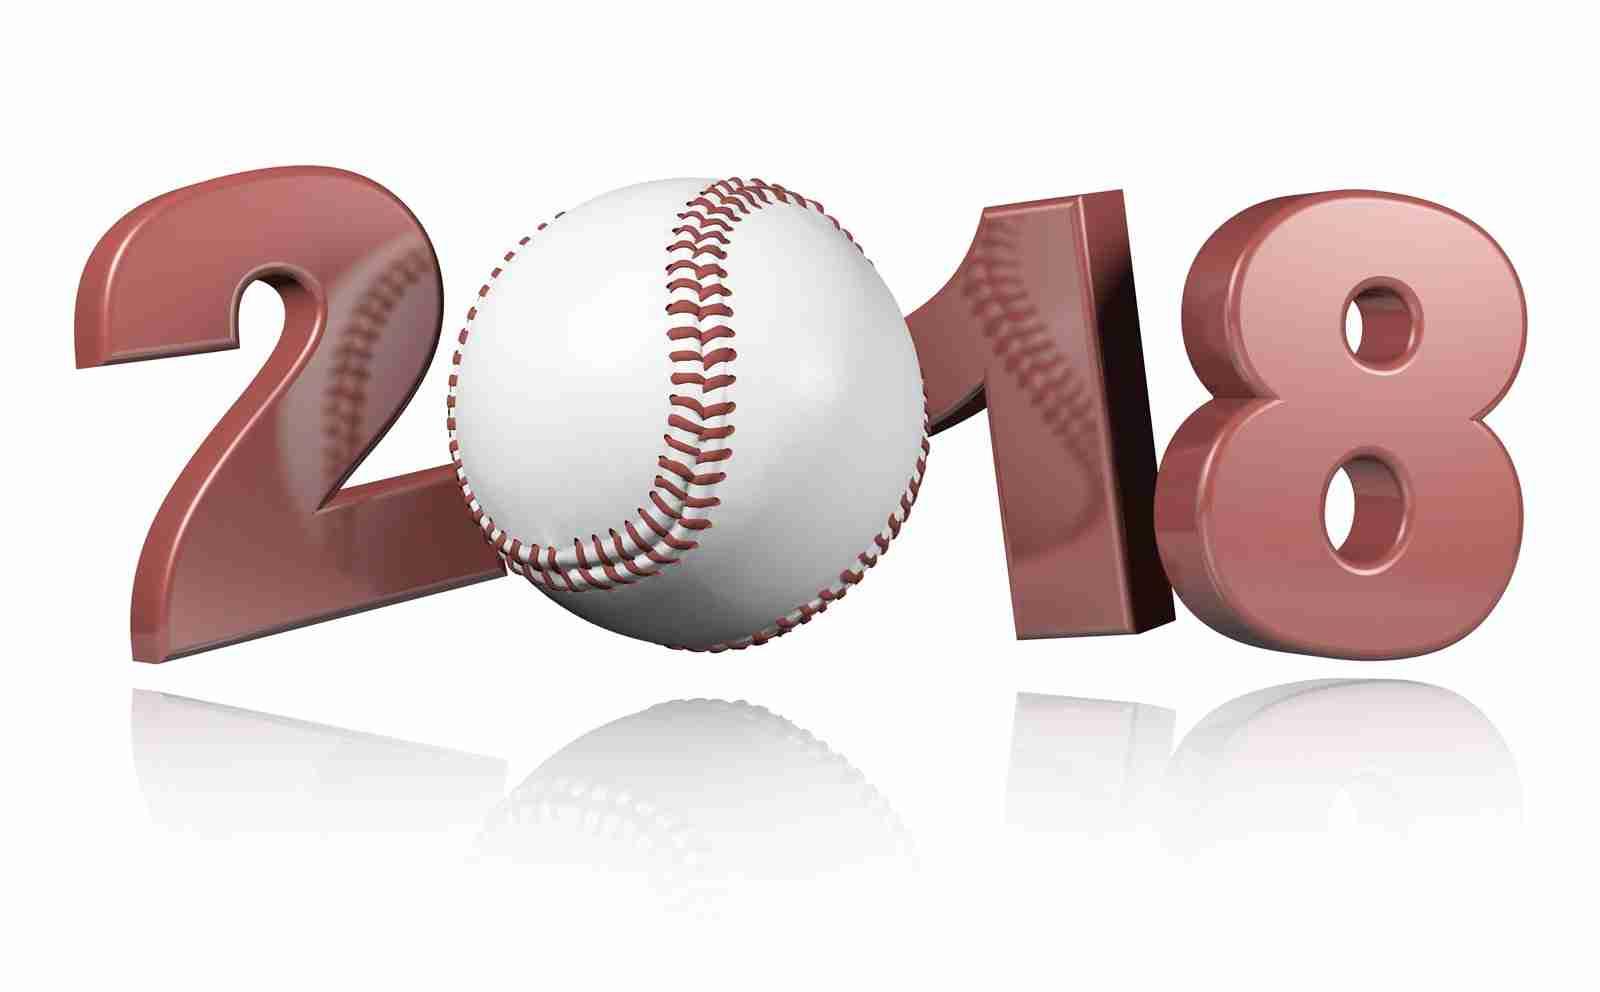 2018 O'Connor Baseball